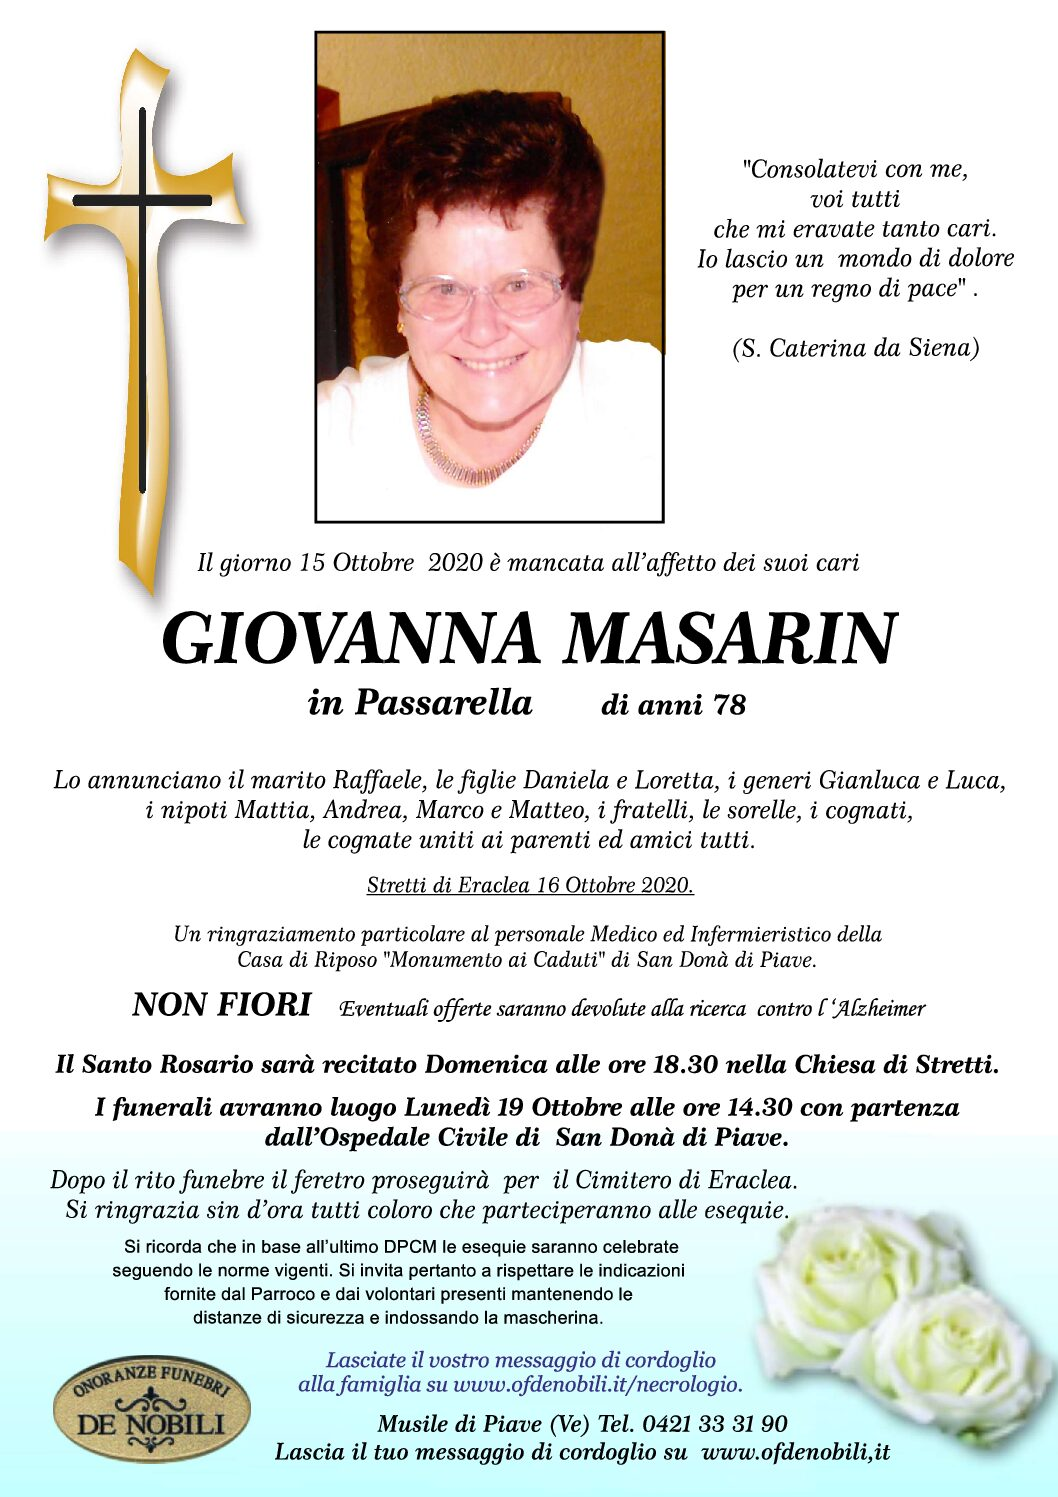 Giovanna Masarin